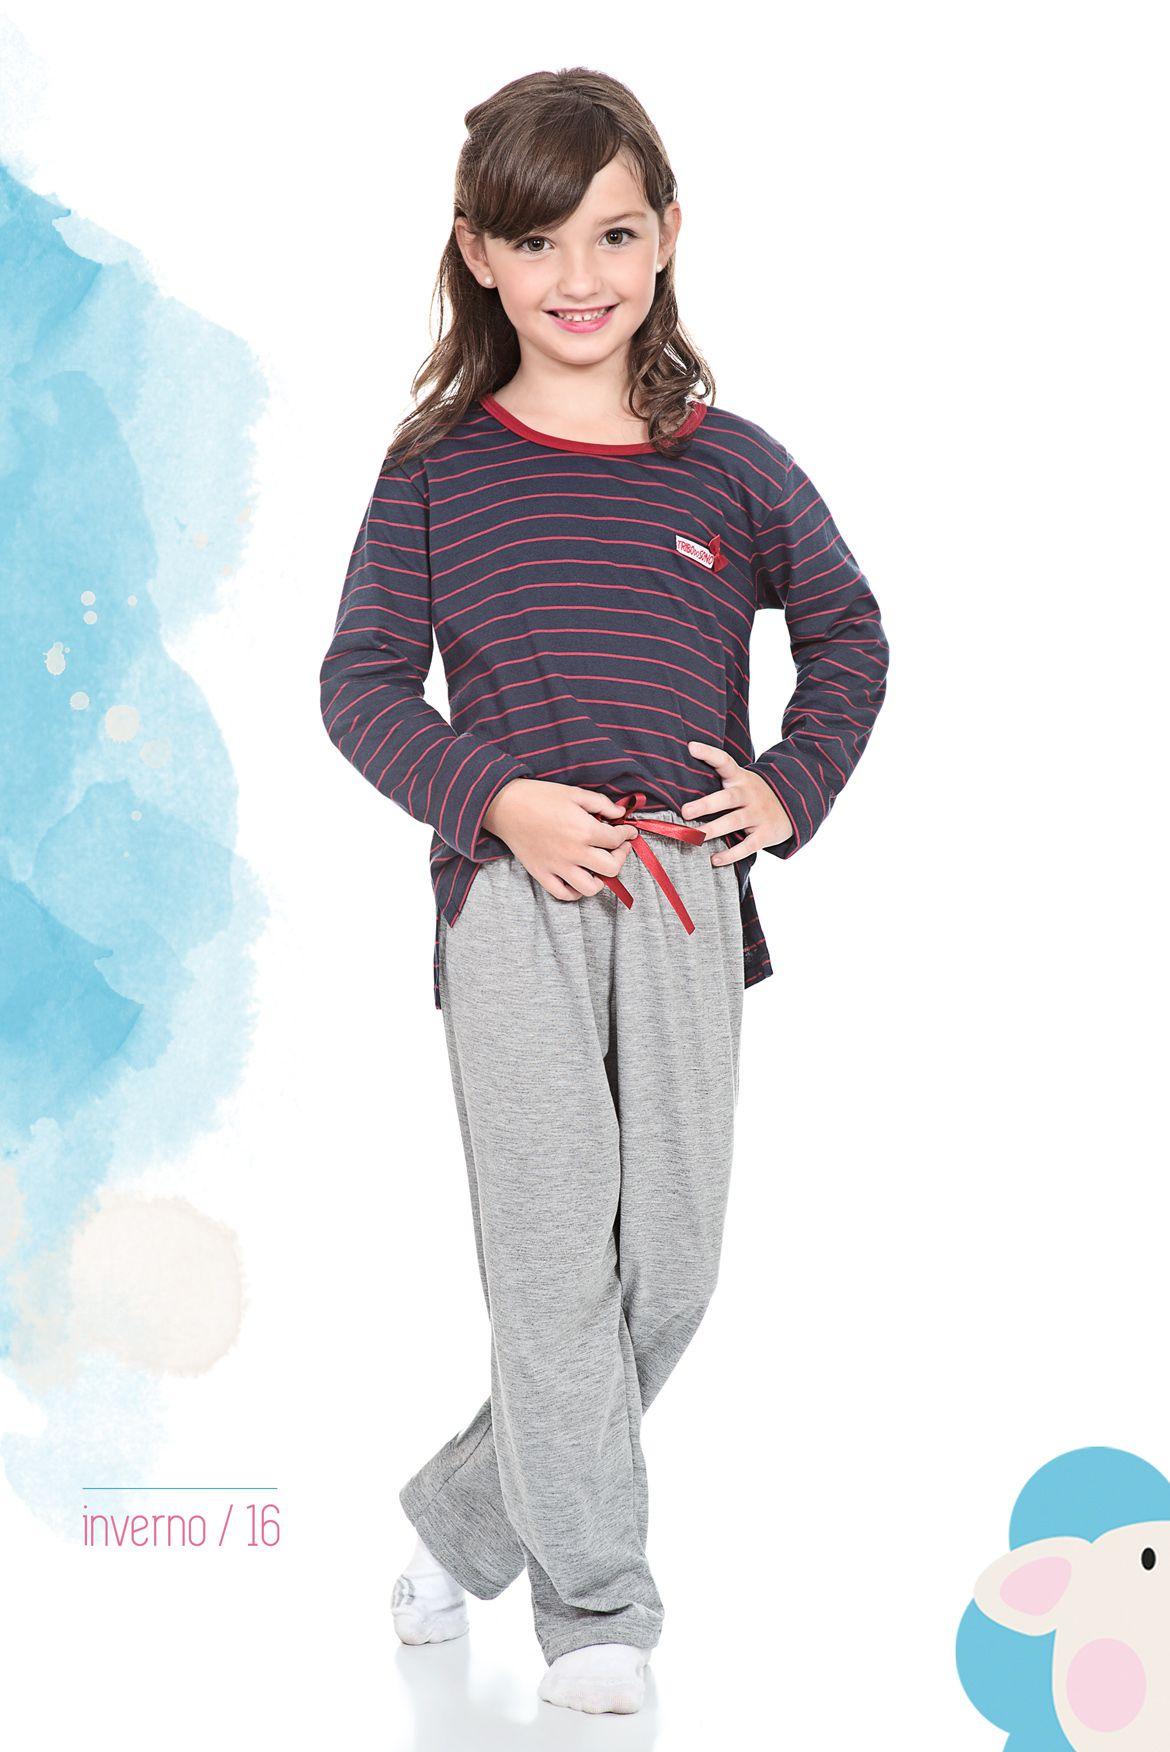 Pijama inverno, infantil, feminino, sleepwear.